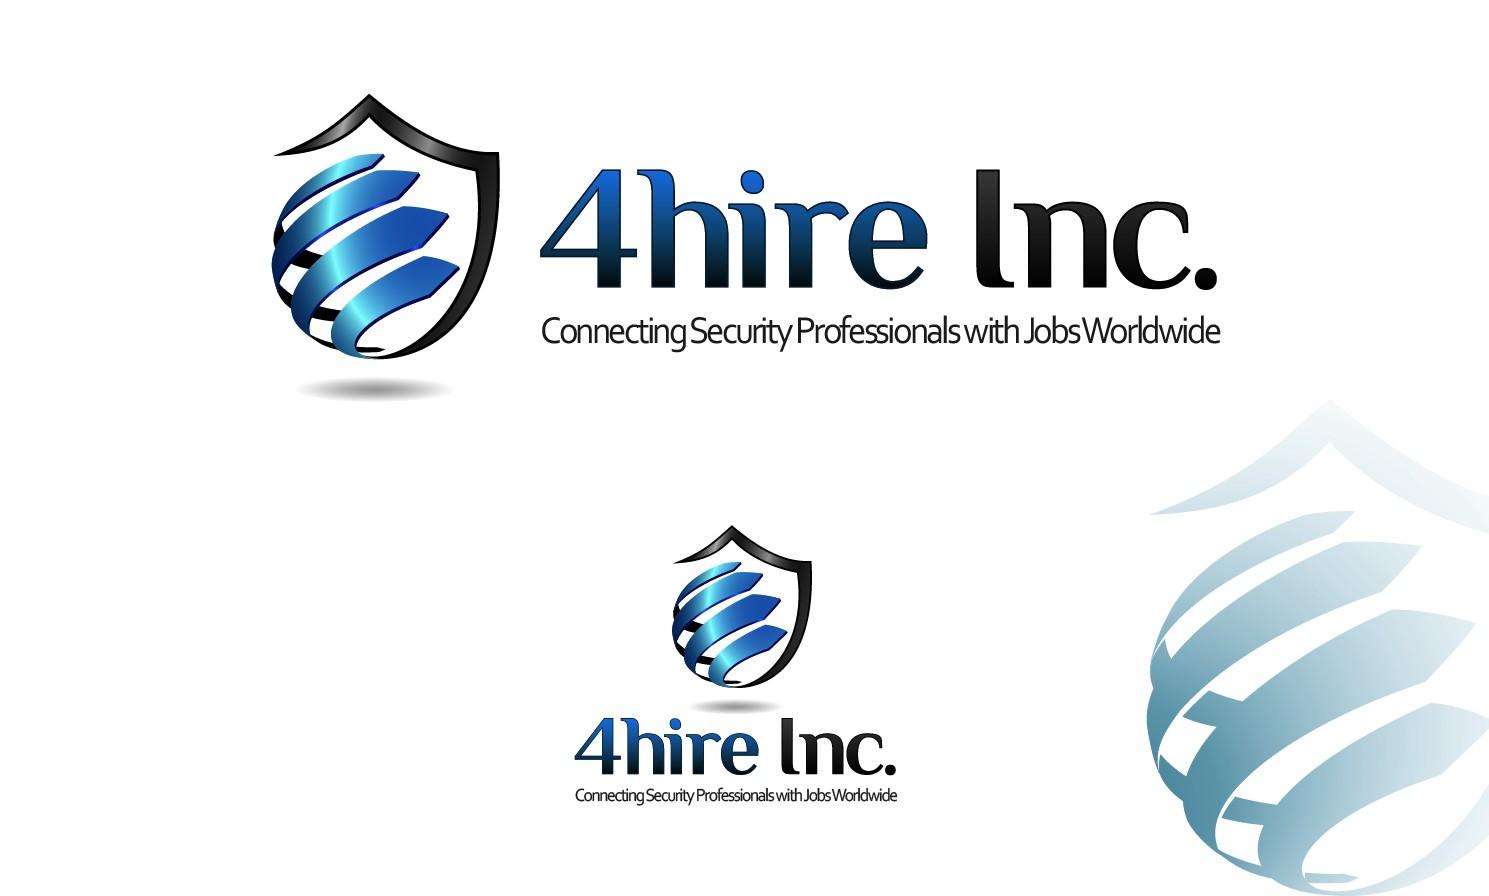 create a logo design for 4hire Inc